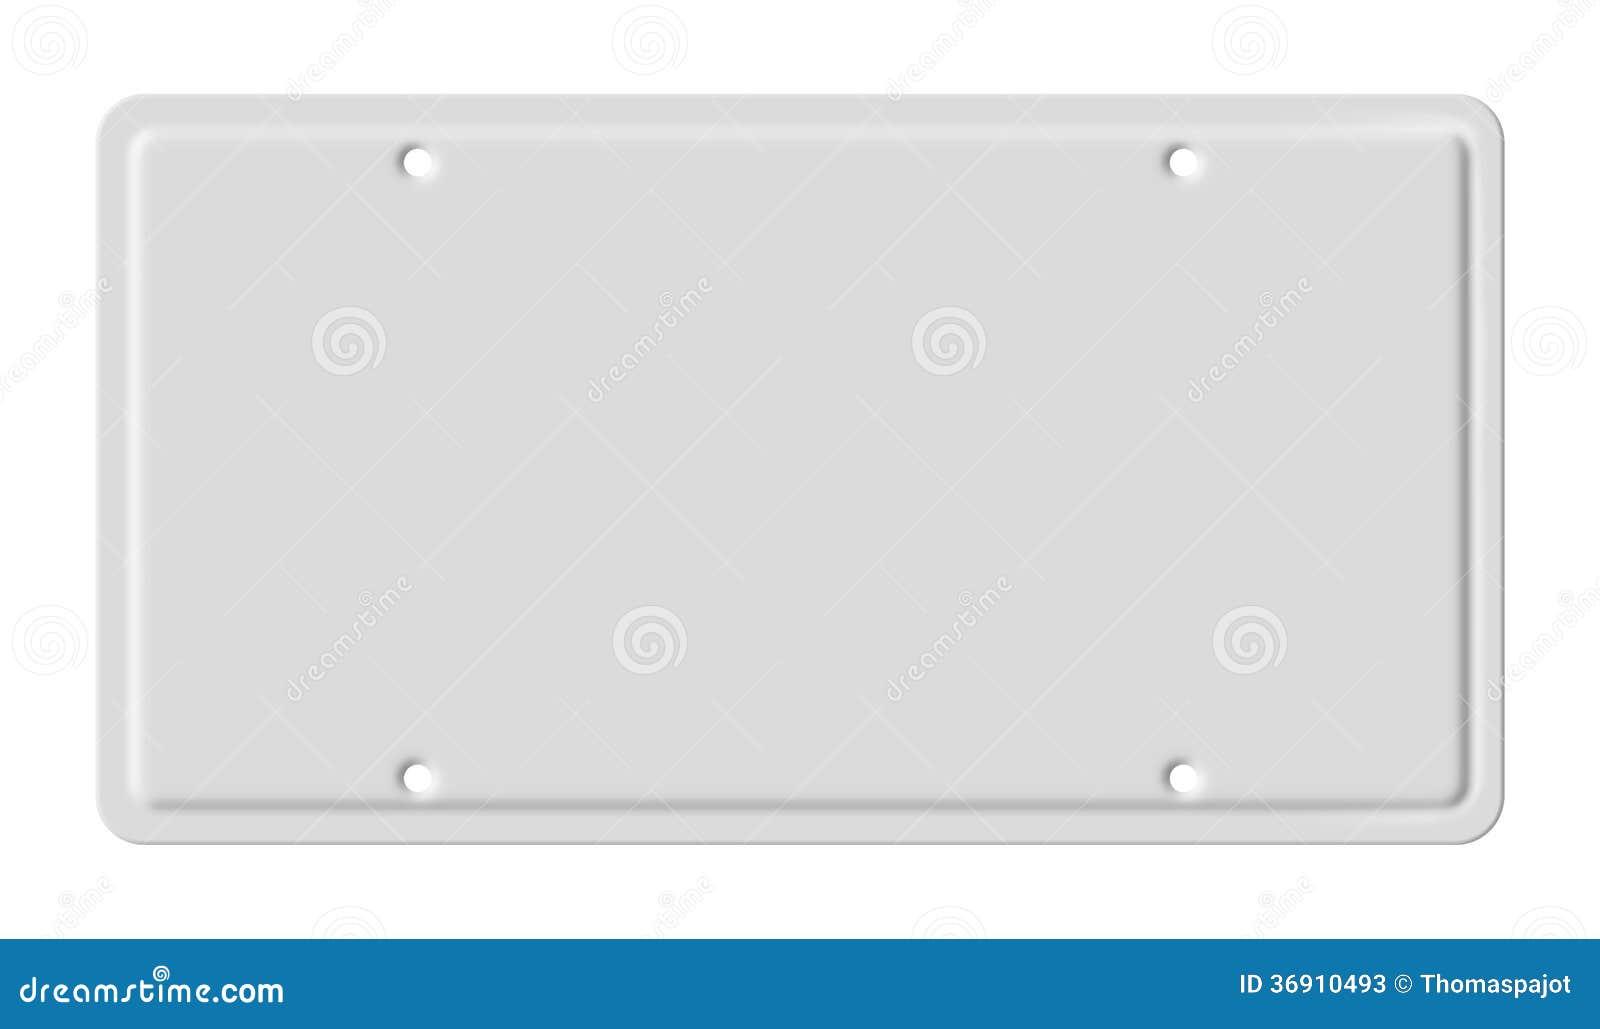 Blank Car Plate Stock Photos Image 36910493